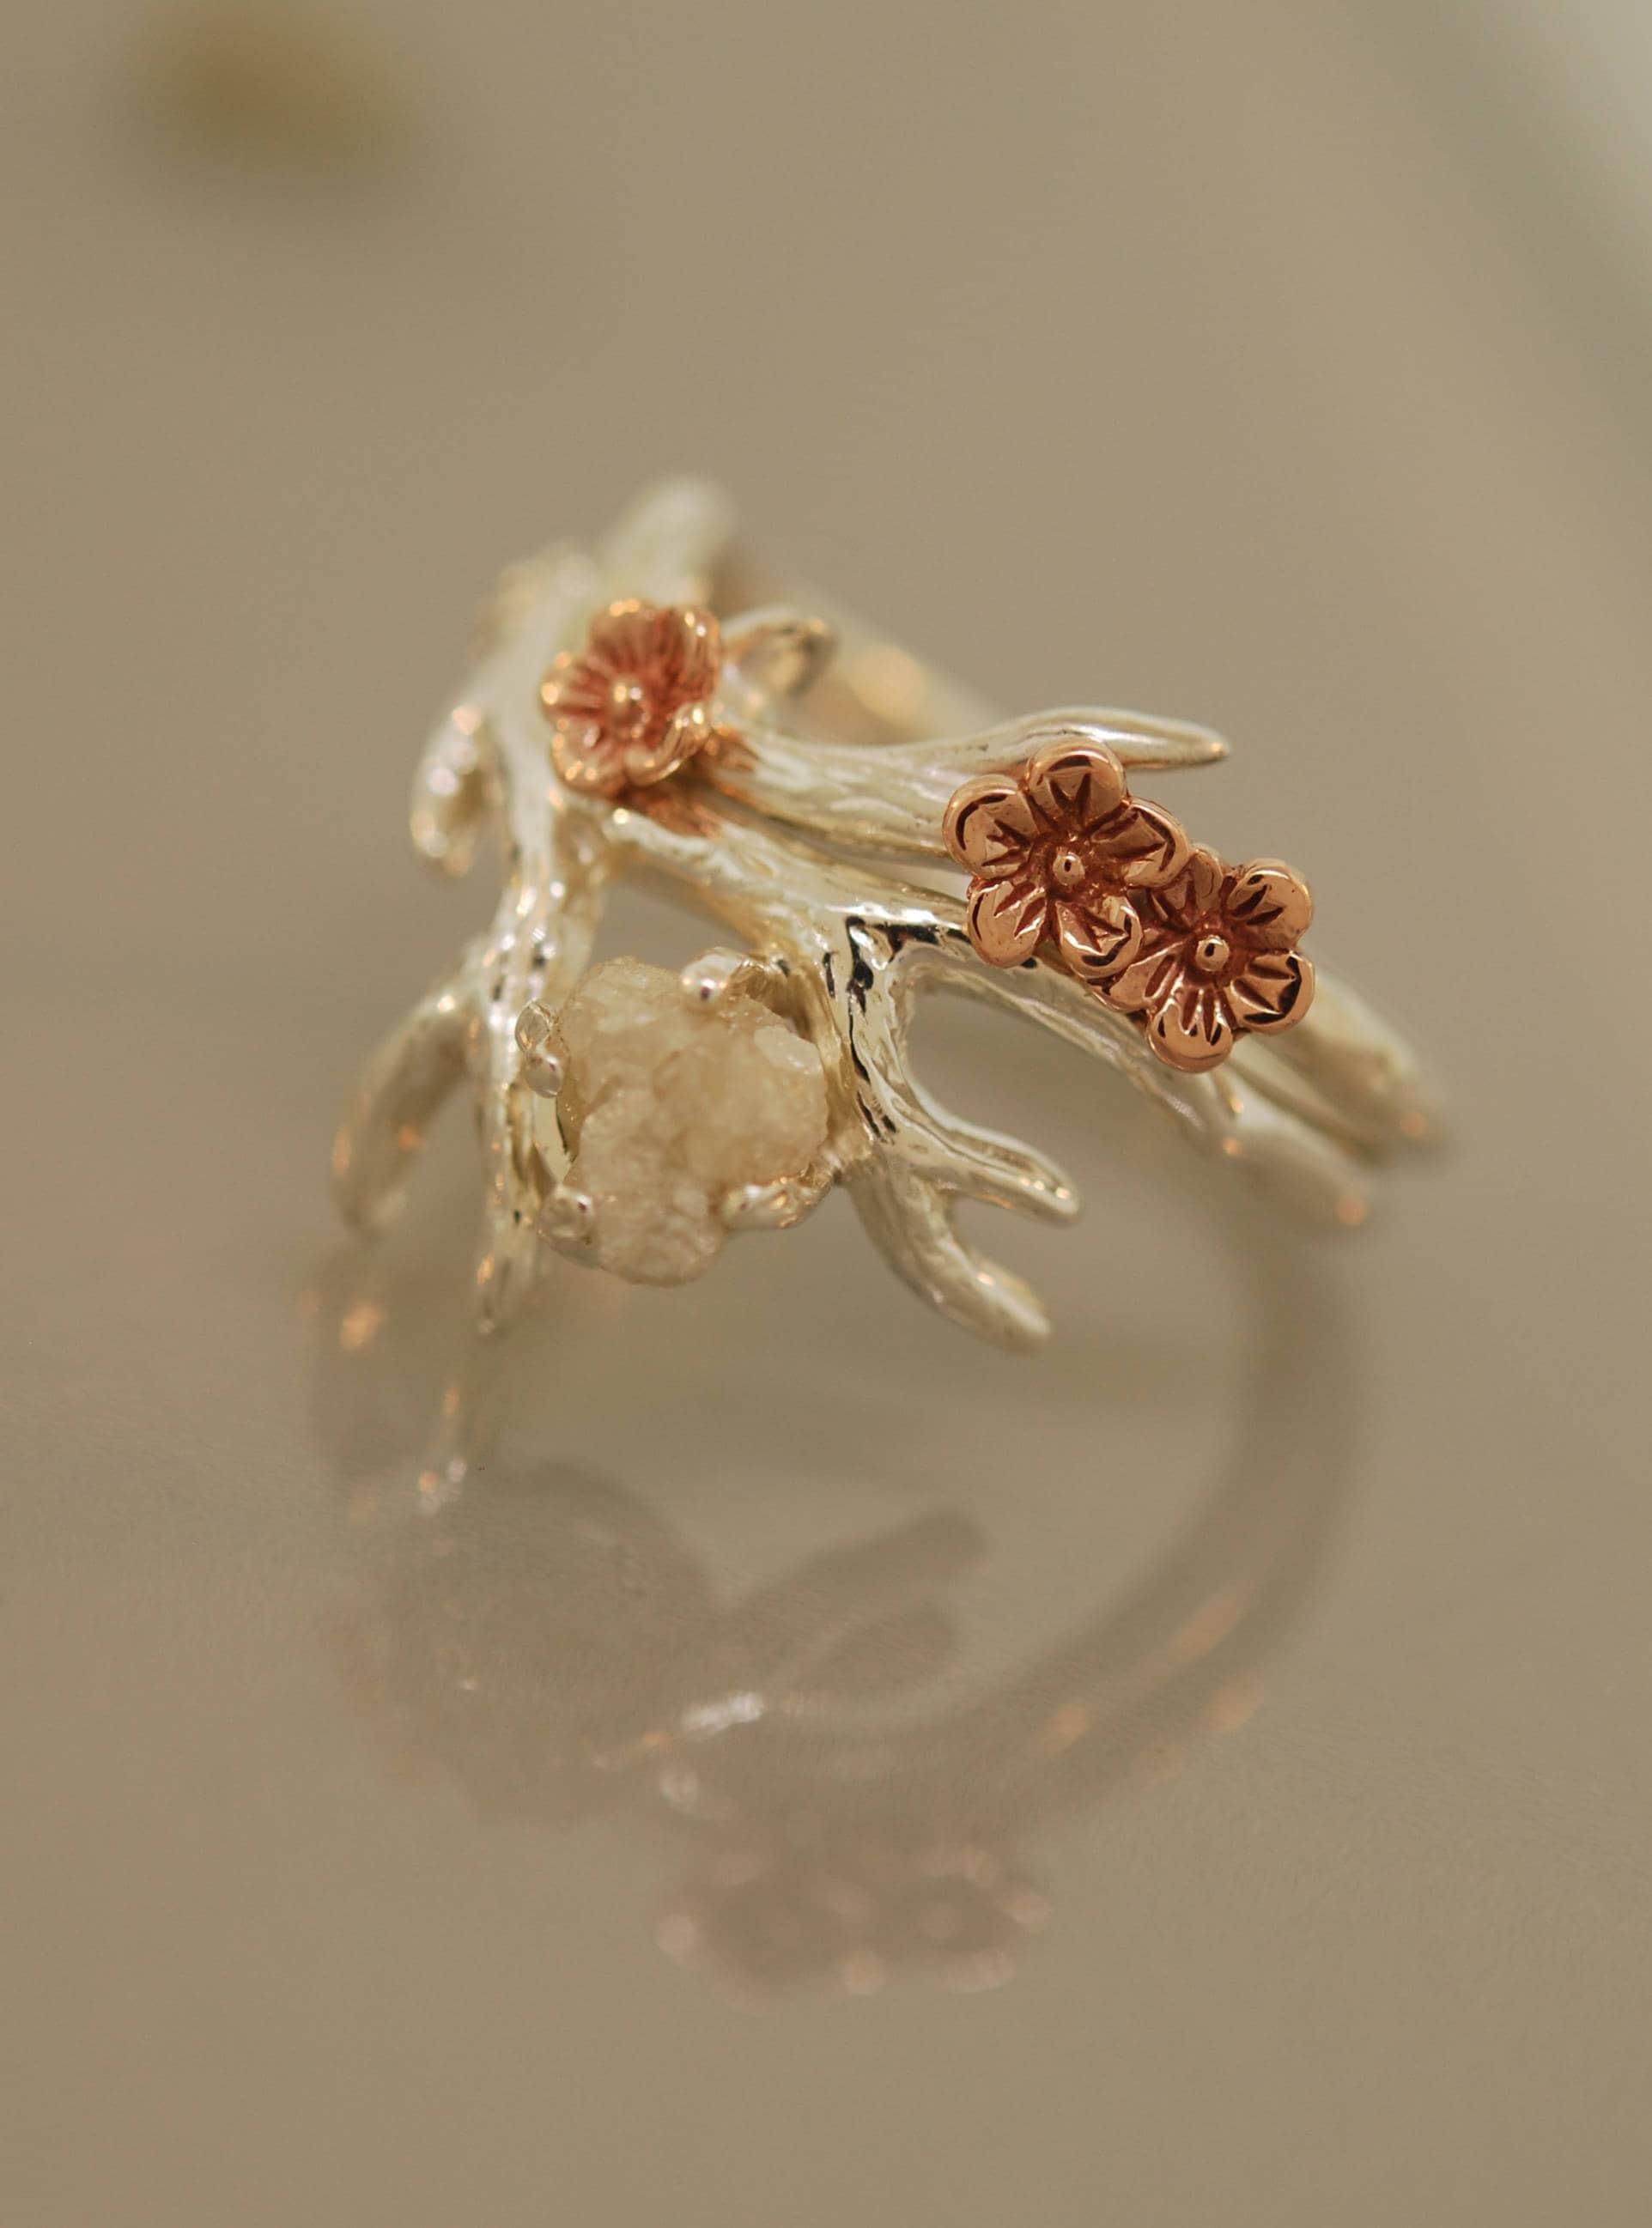 Antler Ring 2 alternative engagement ring twig ring gold